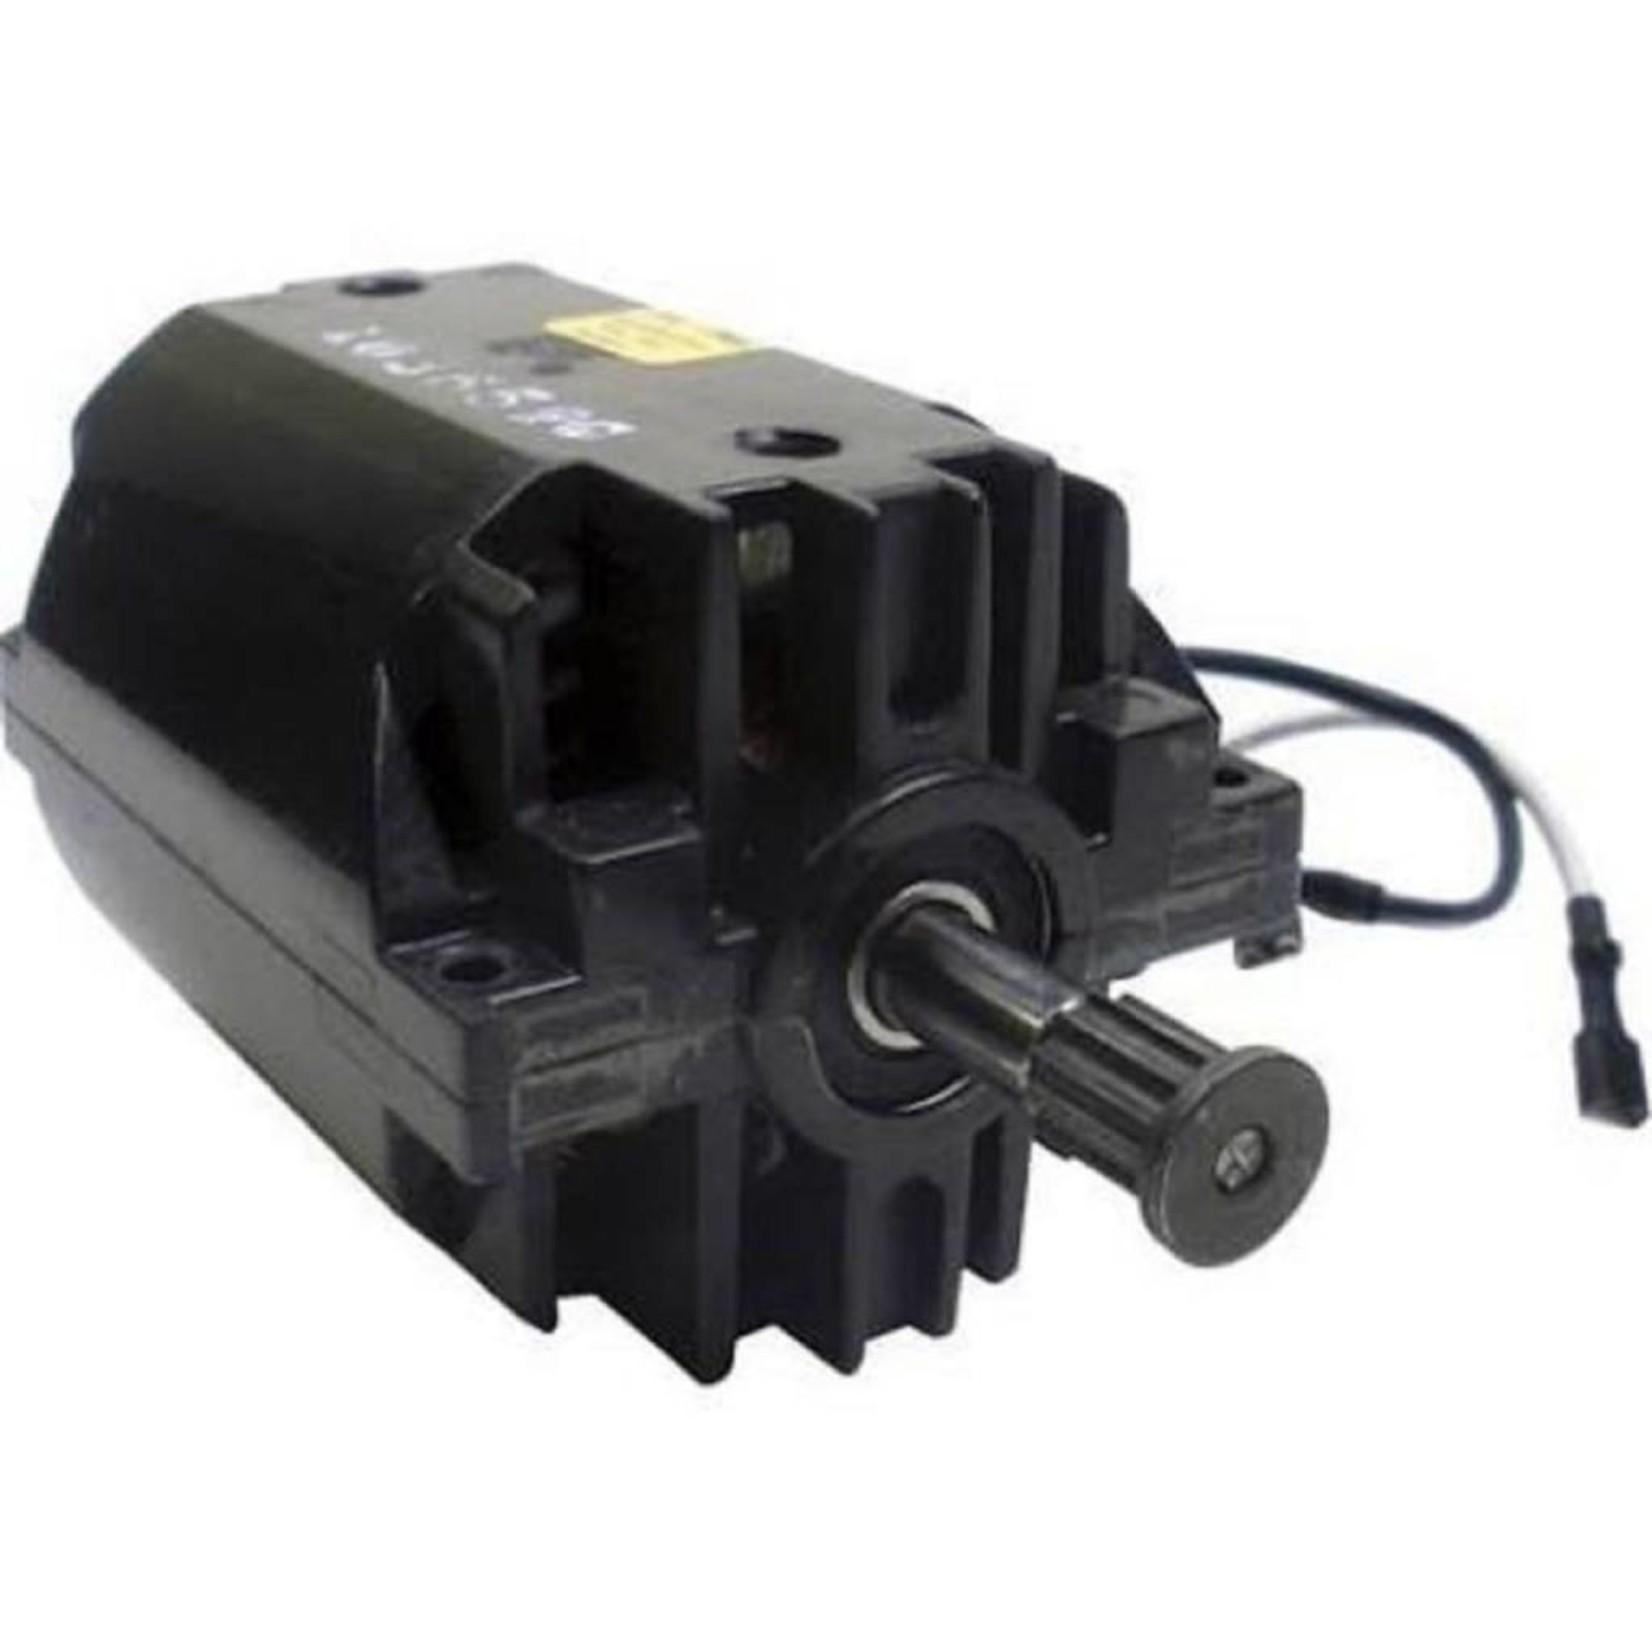 BEAM BEAM Solaire Powerhead Motor